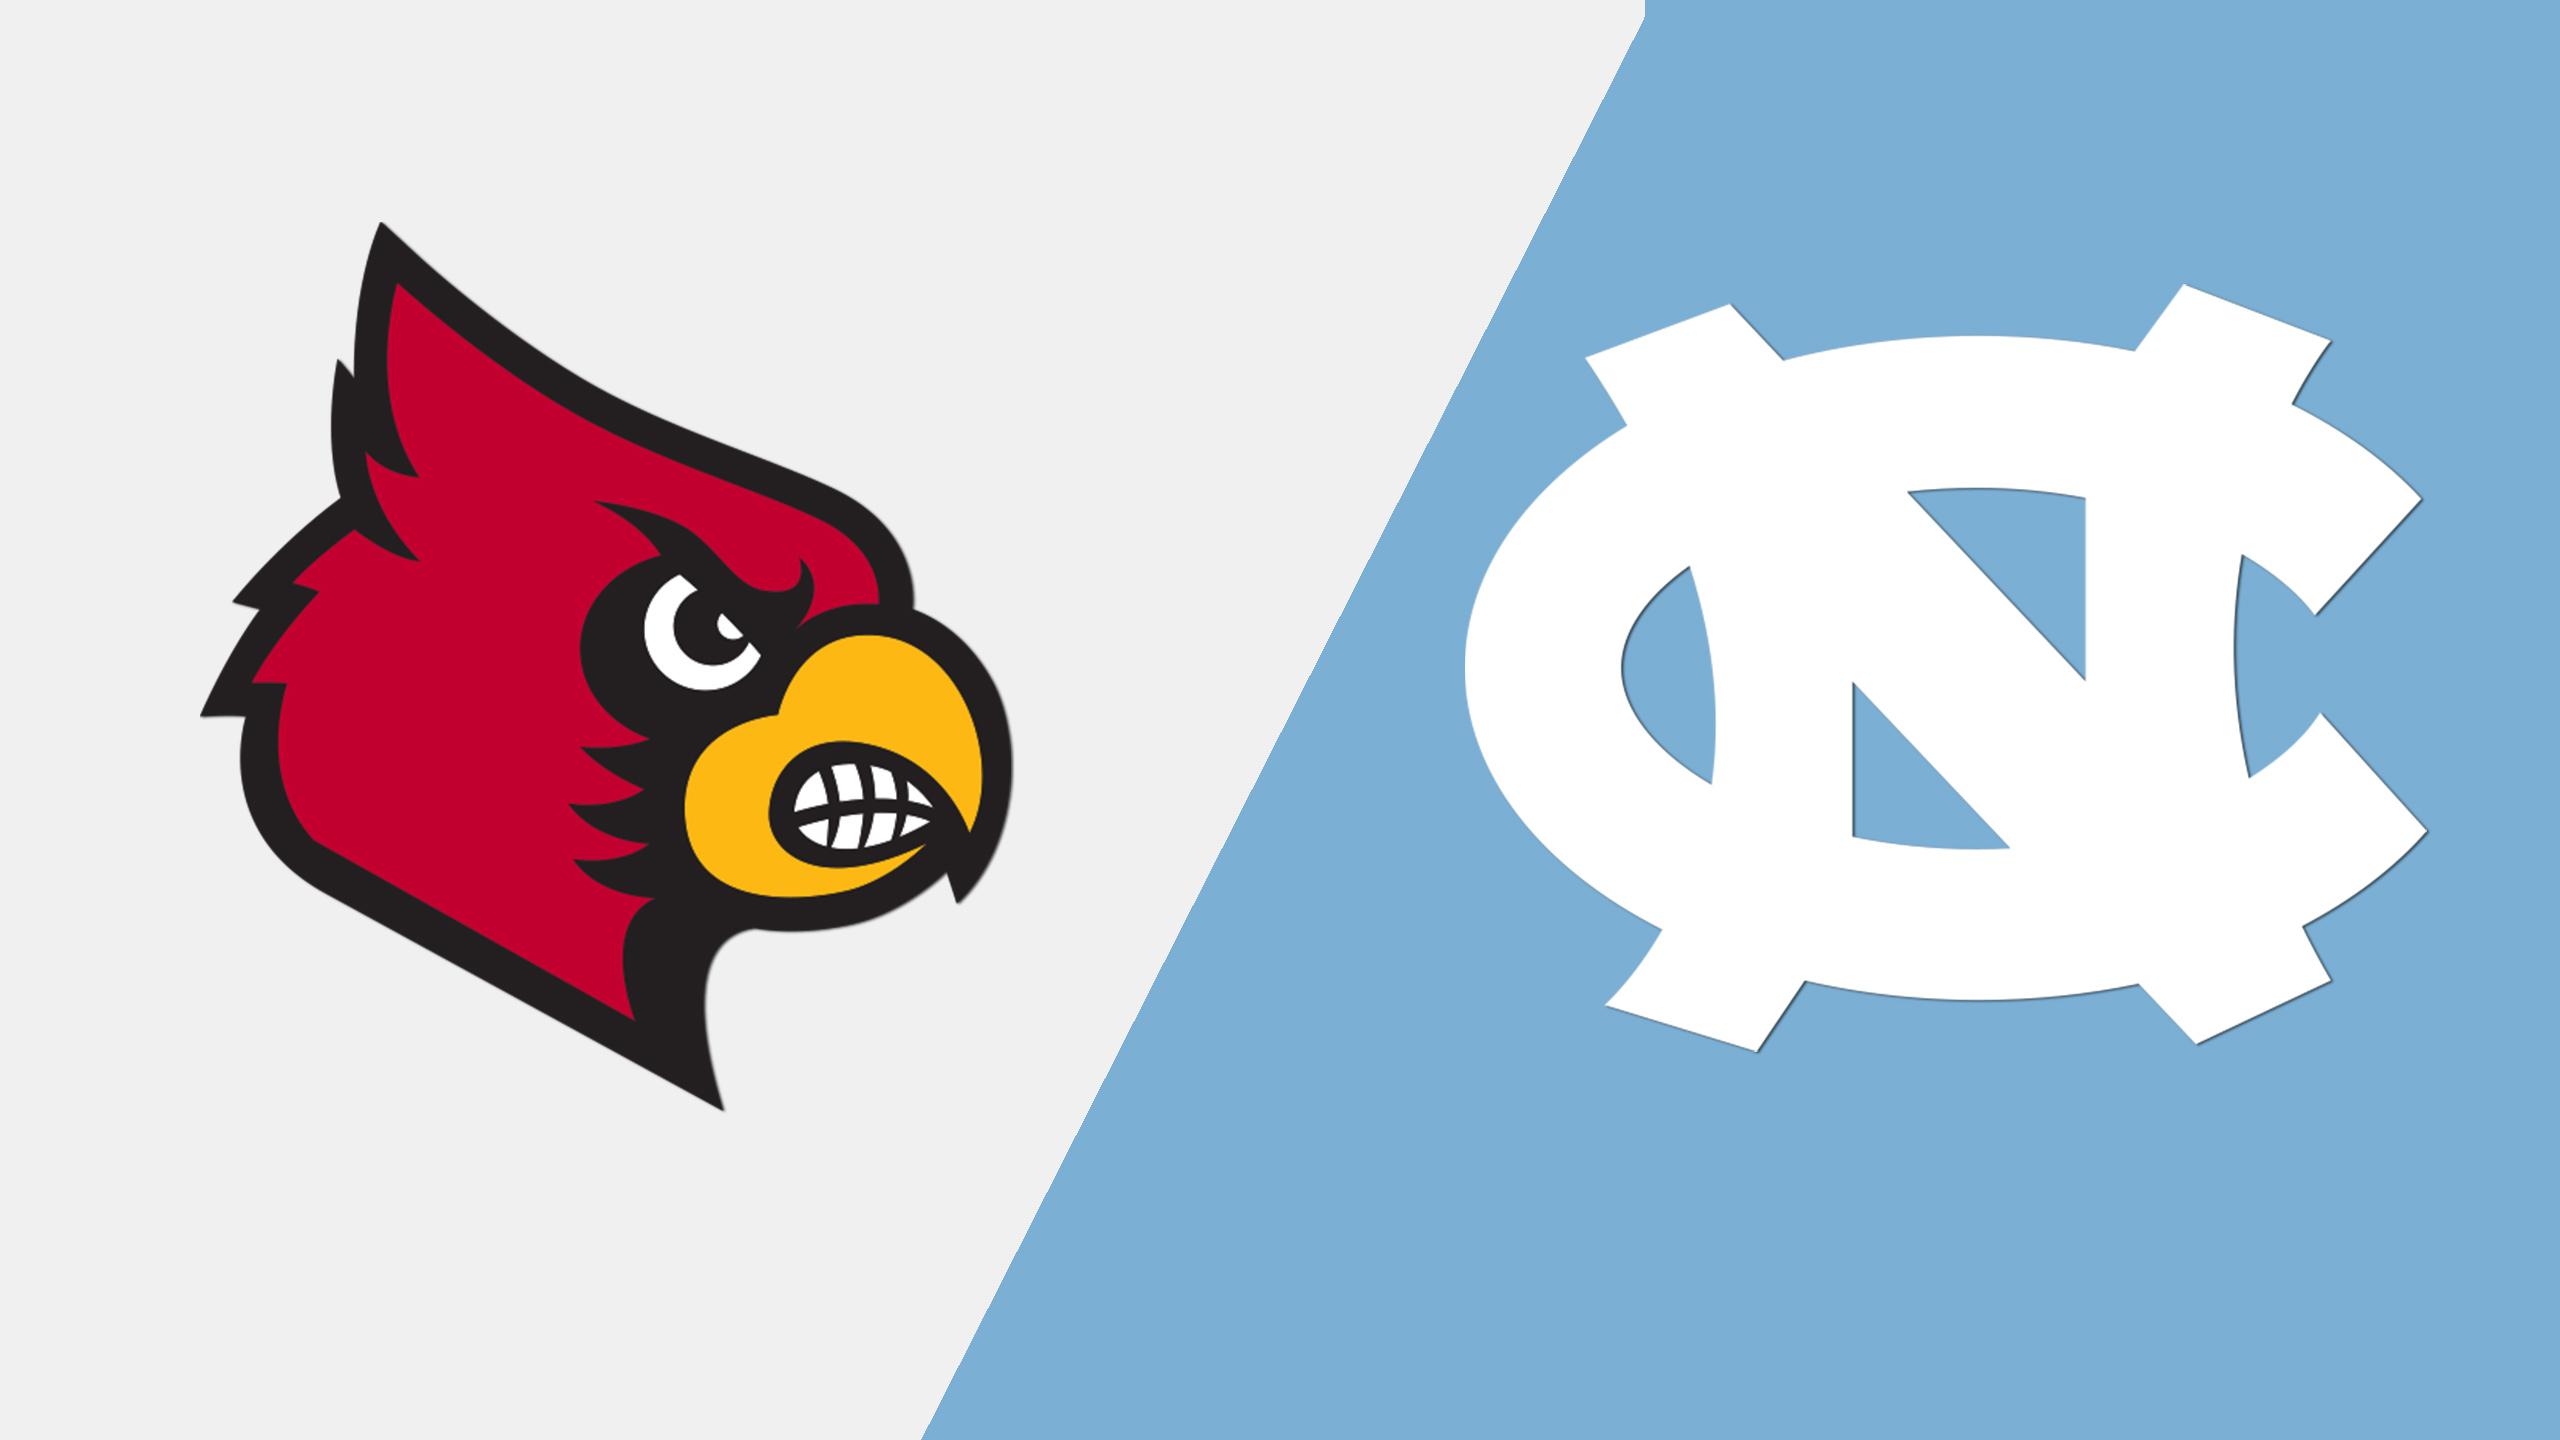 #10 Louisville vs. #4 North Carolina (Championship) (ACC Men's Soccer Championship)